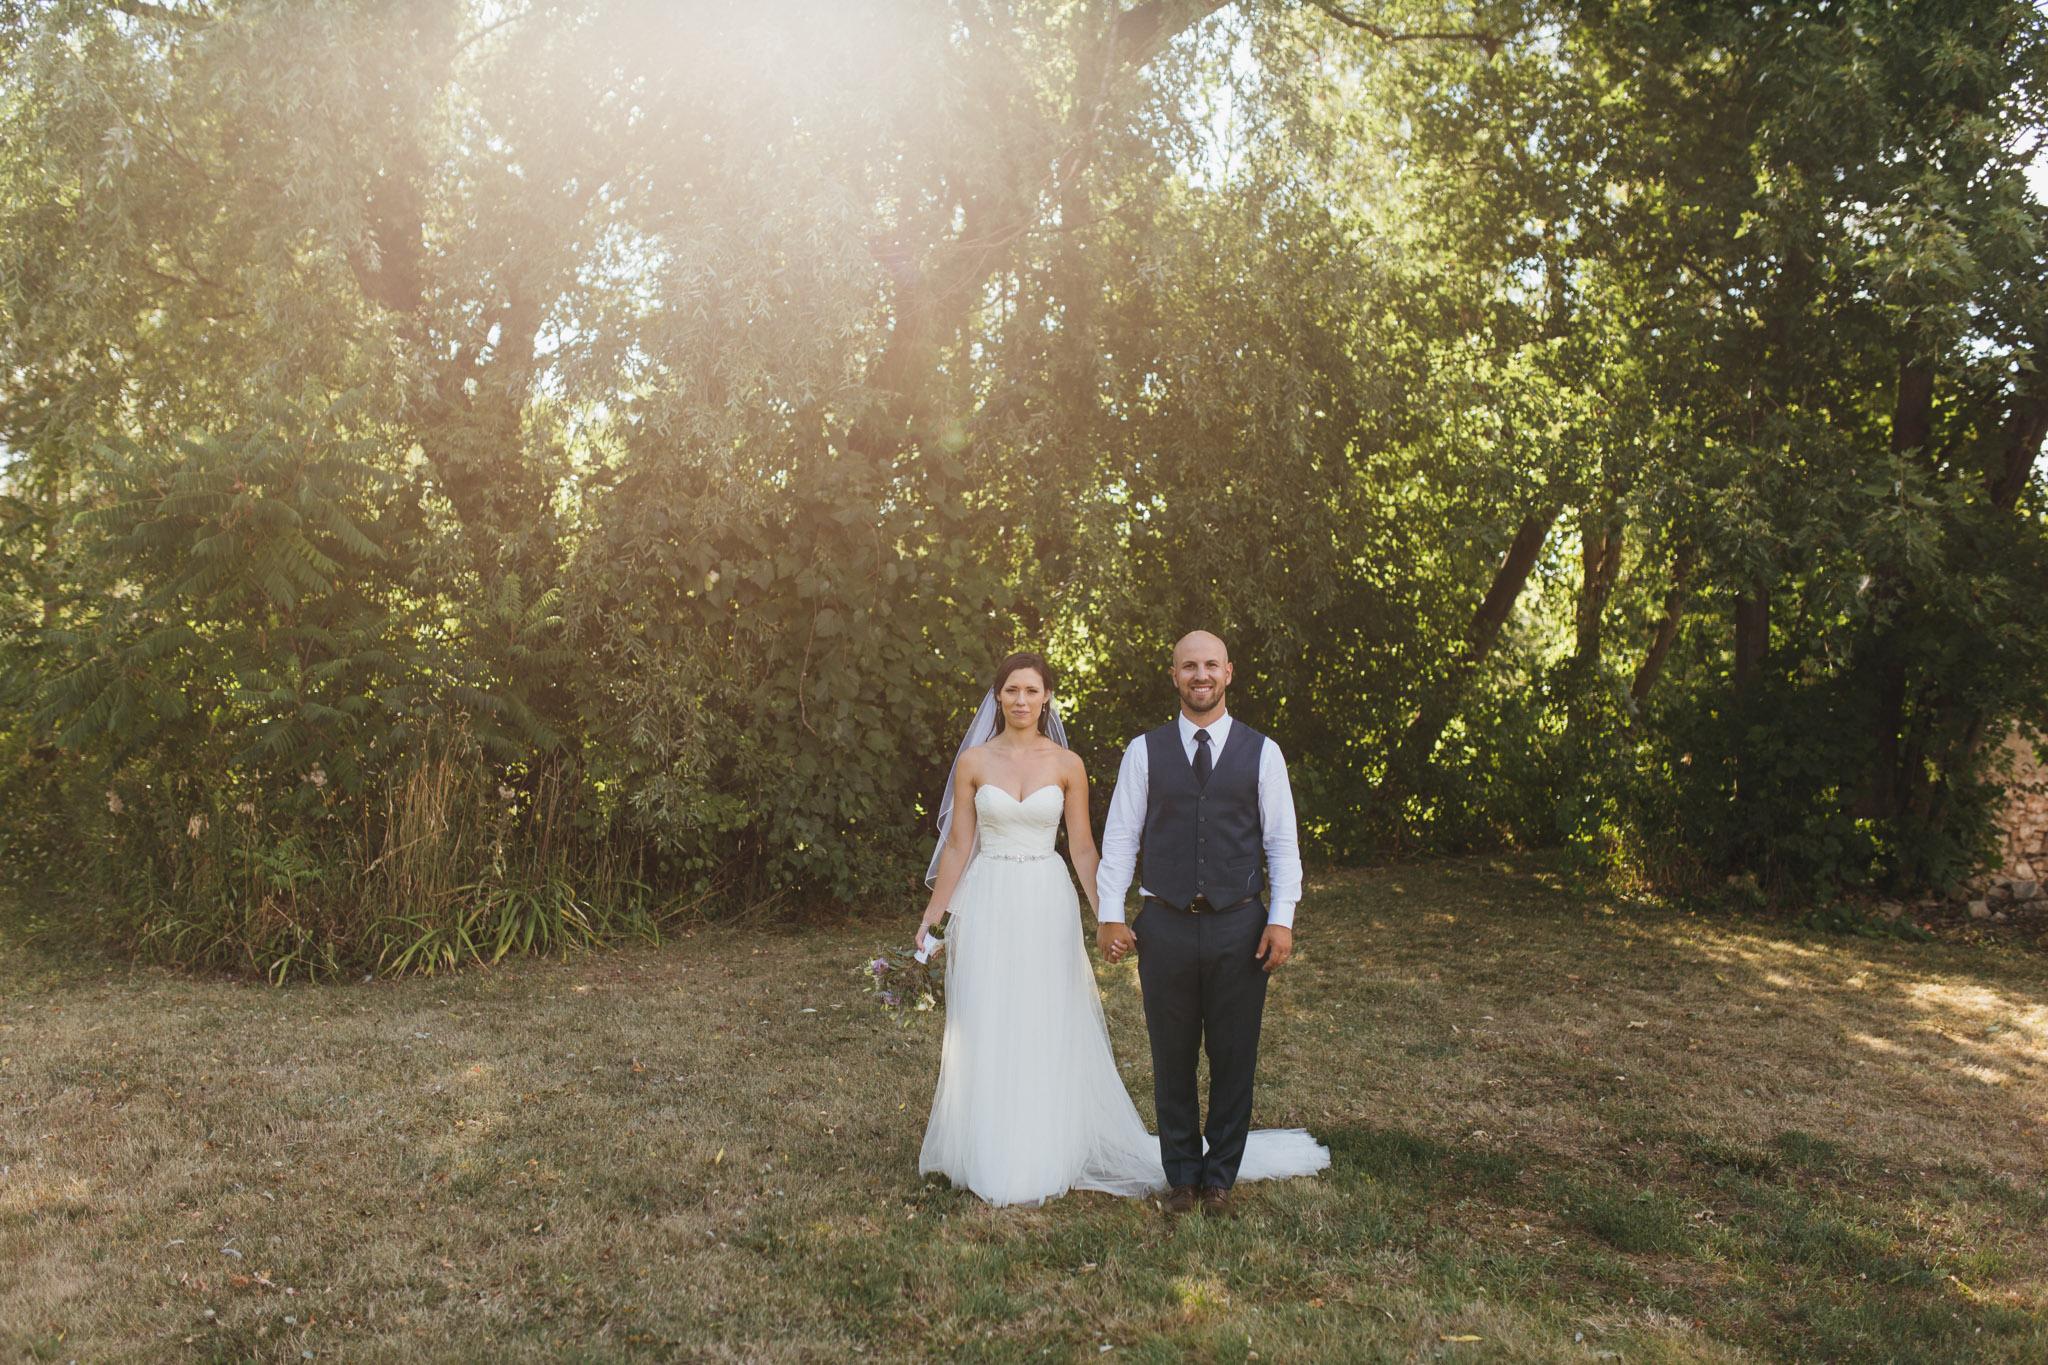 springer-house-burlington-wedding-photographer-457-of-756.jpg